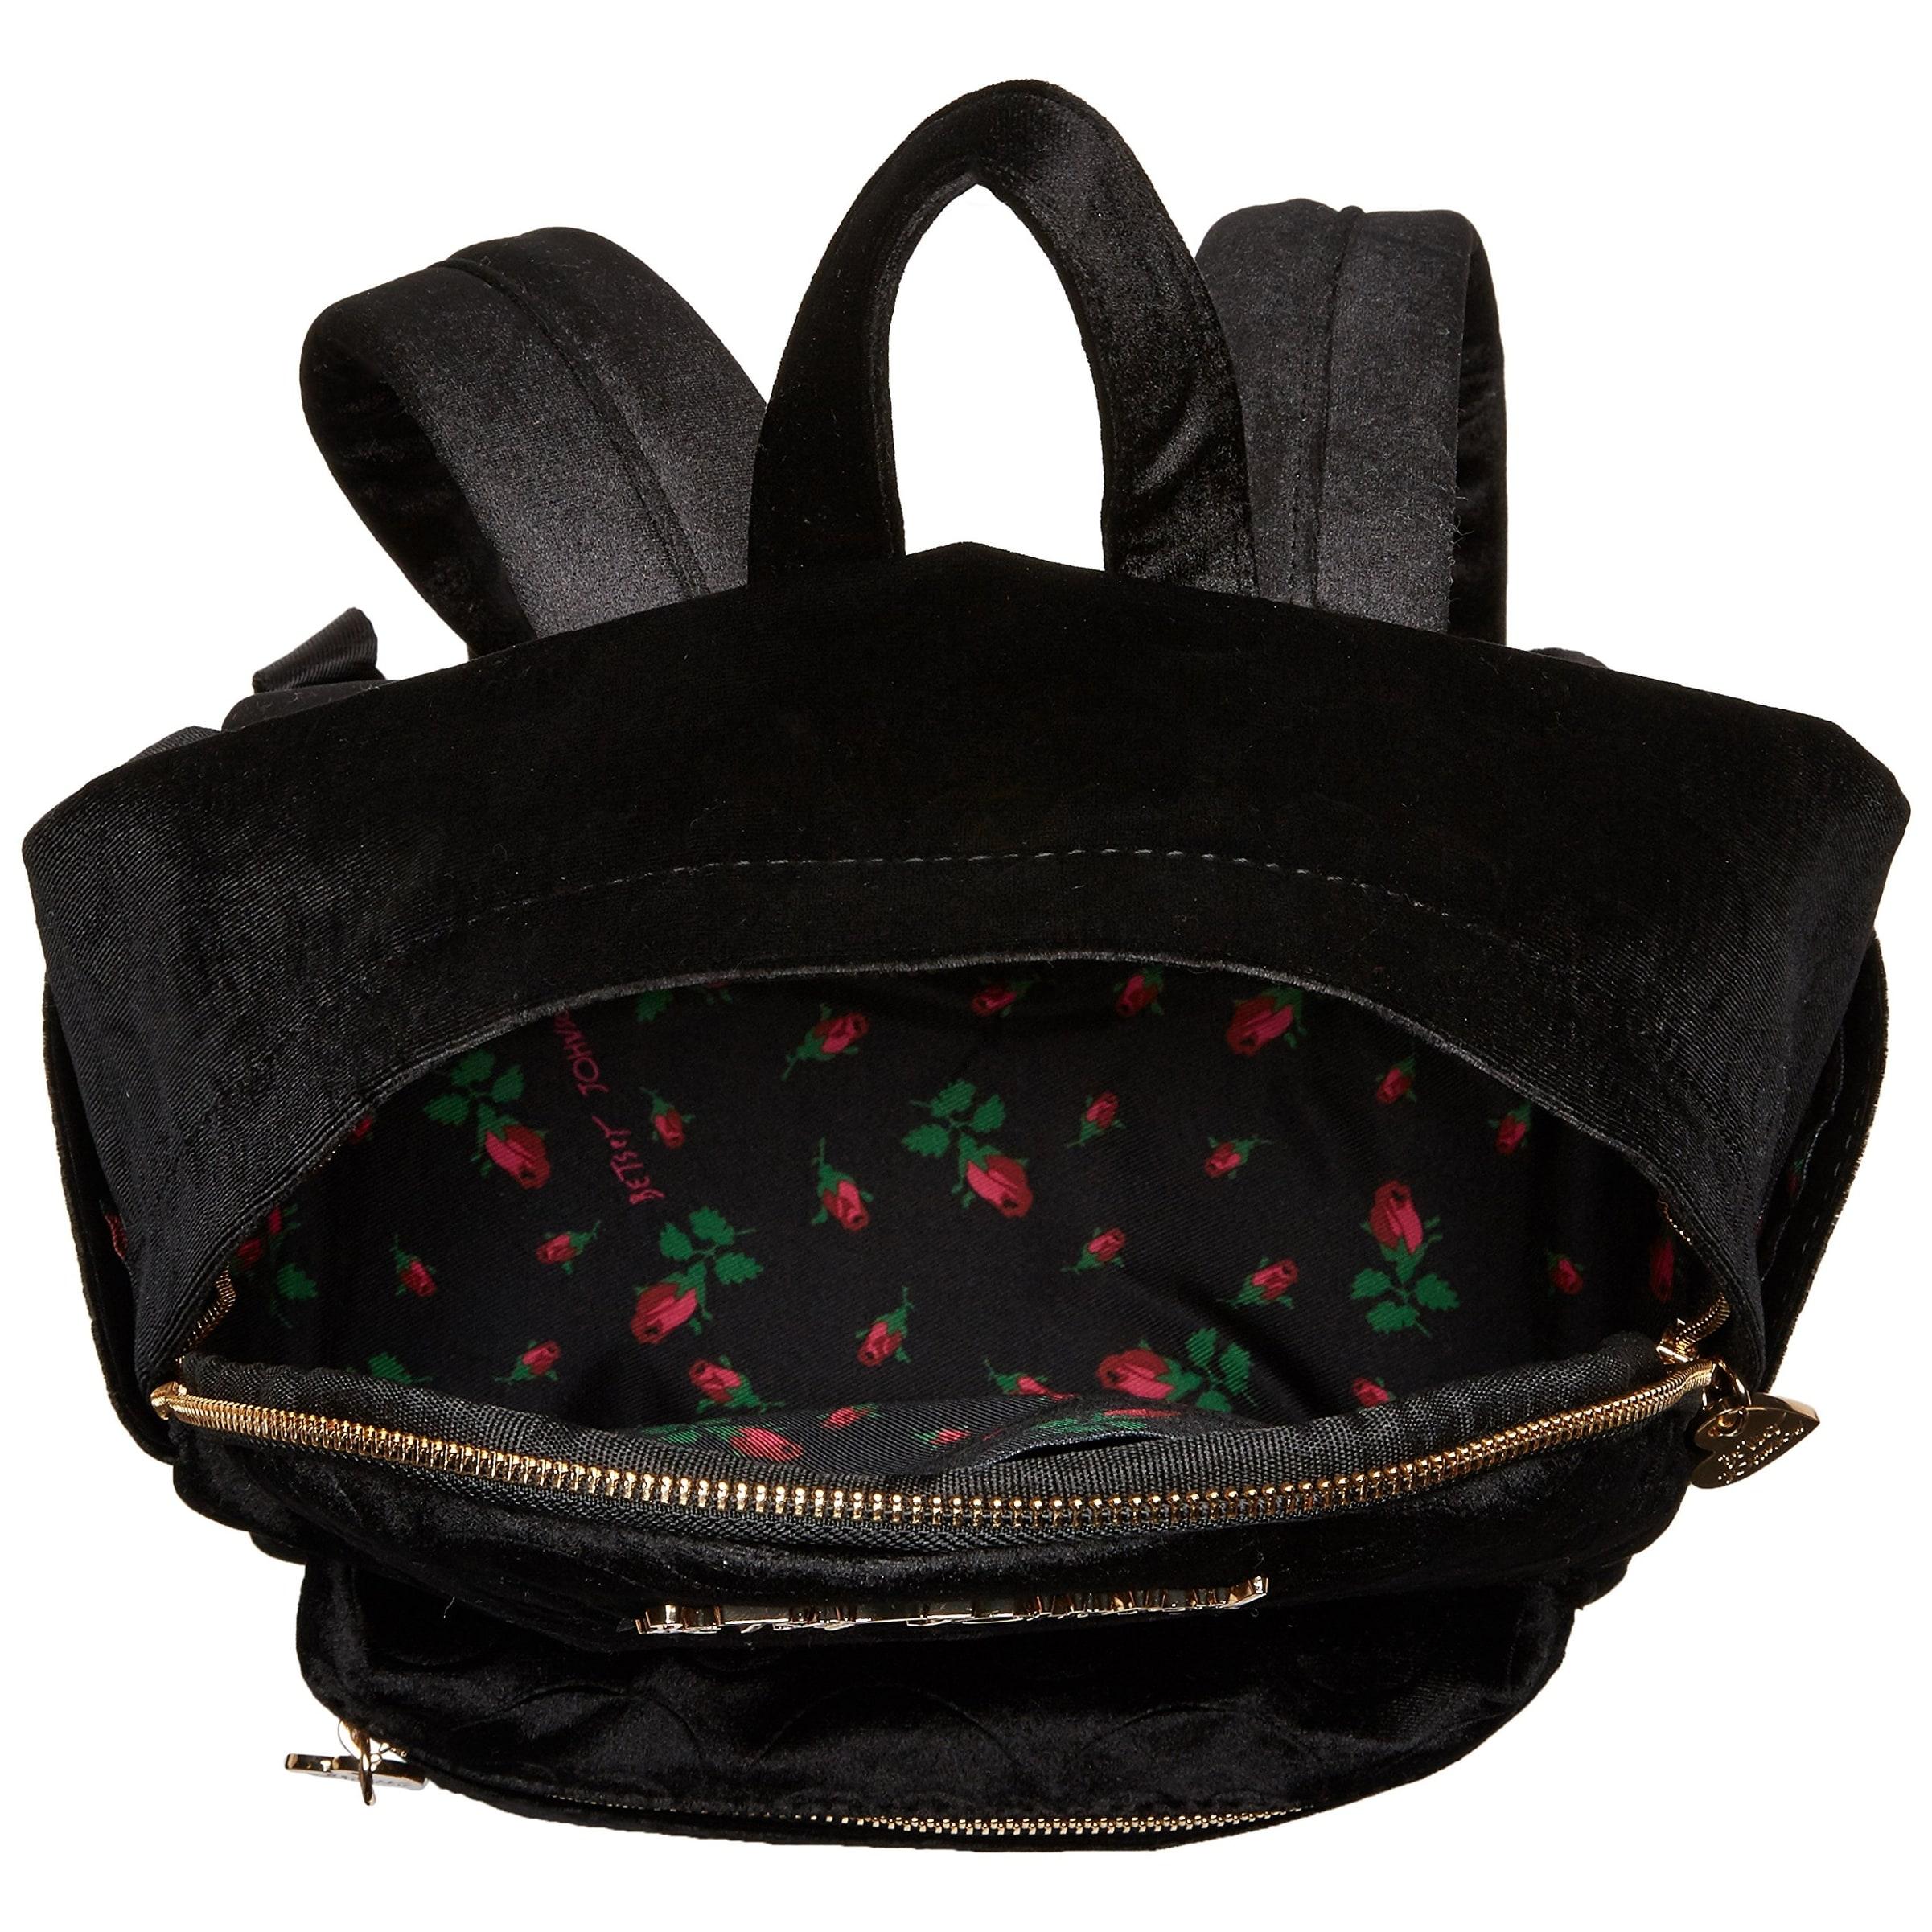 Shop Betsey Johnson NEW Black Small Skull Backpack Style Handbag Purse -  Free Shipping Today - Overstock - 19557068 eb24c29e86899